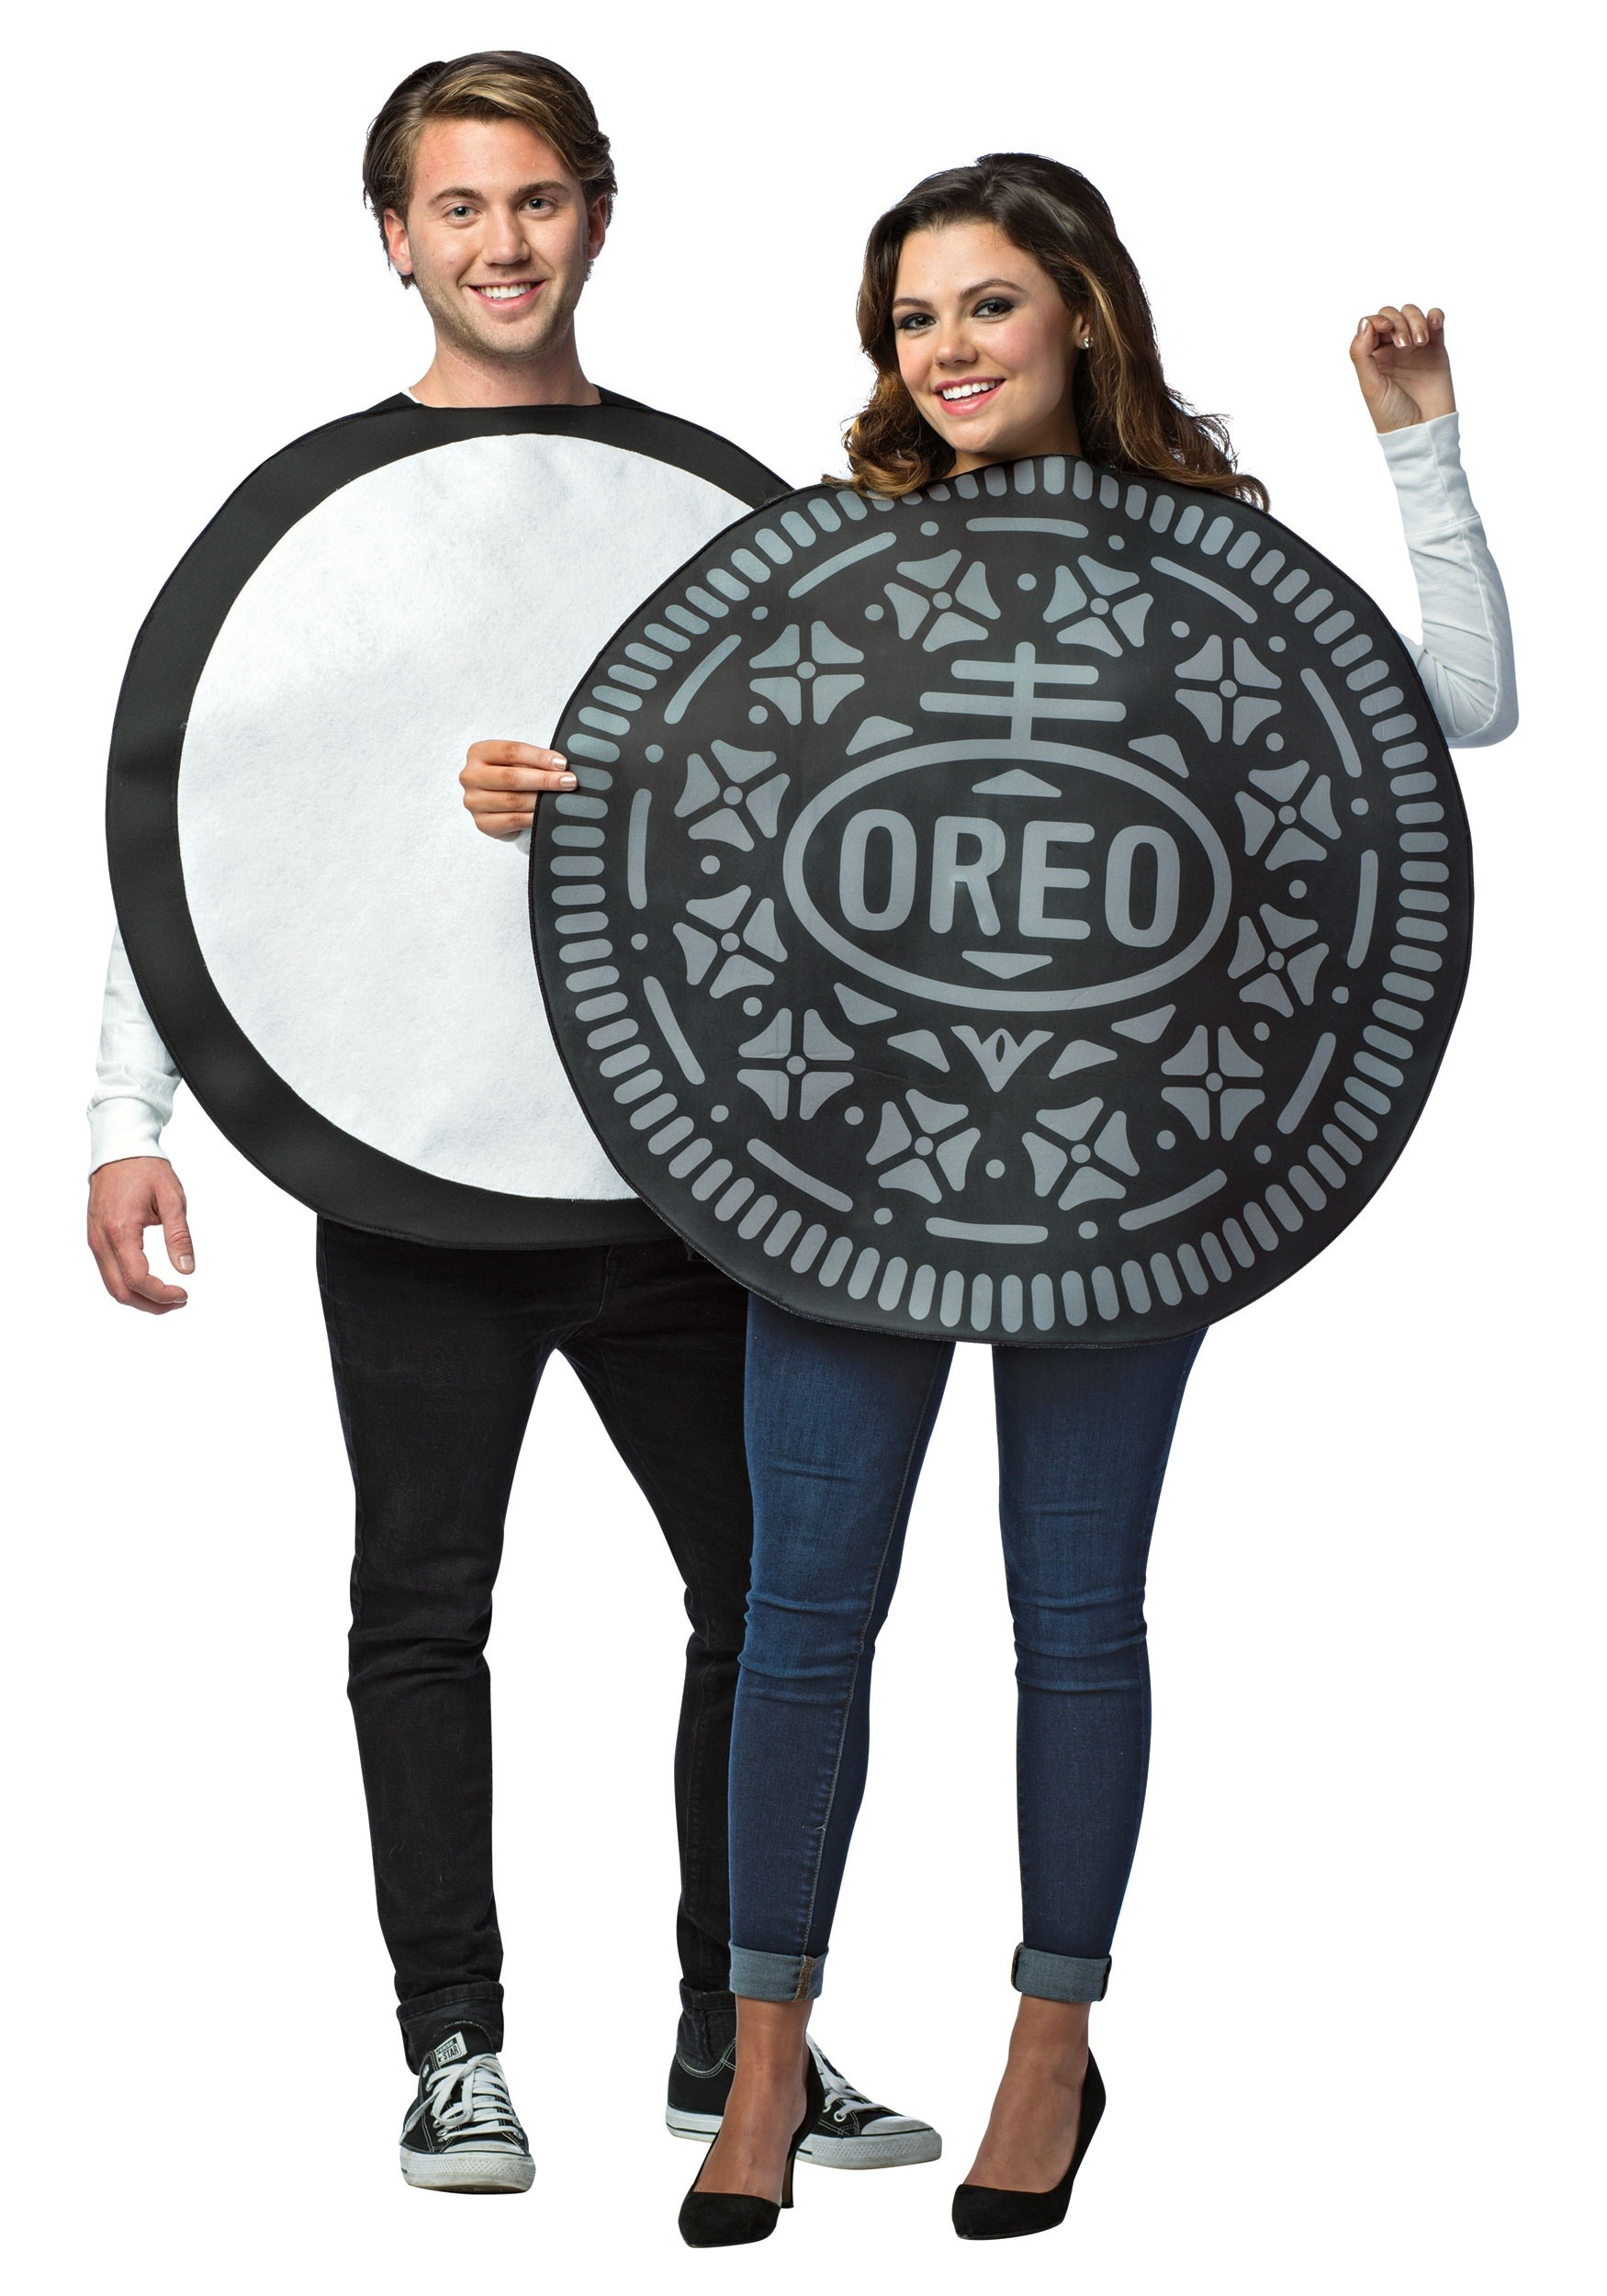 Morris Costumes Adult Oreo Cookie Couples Costume